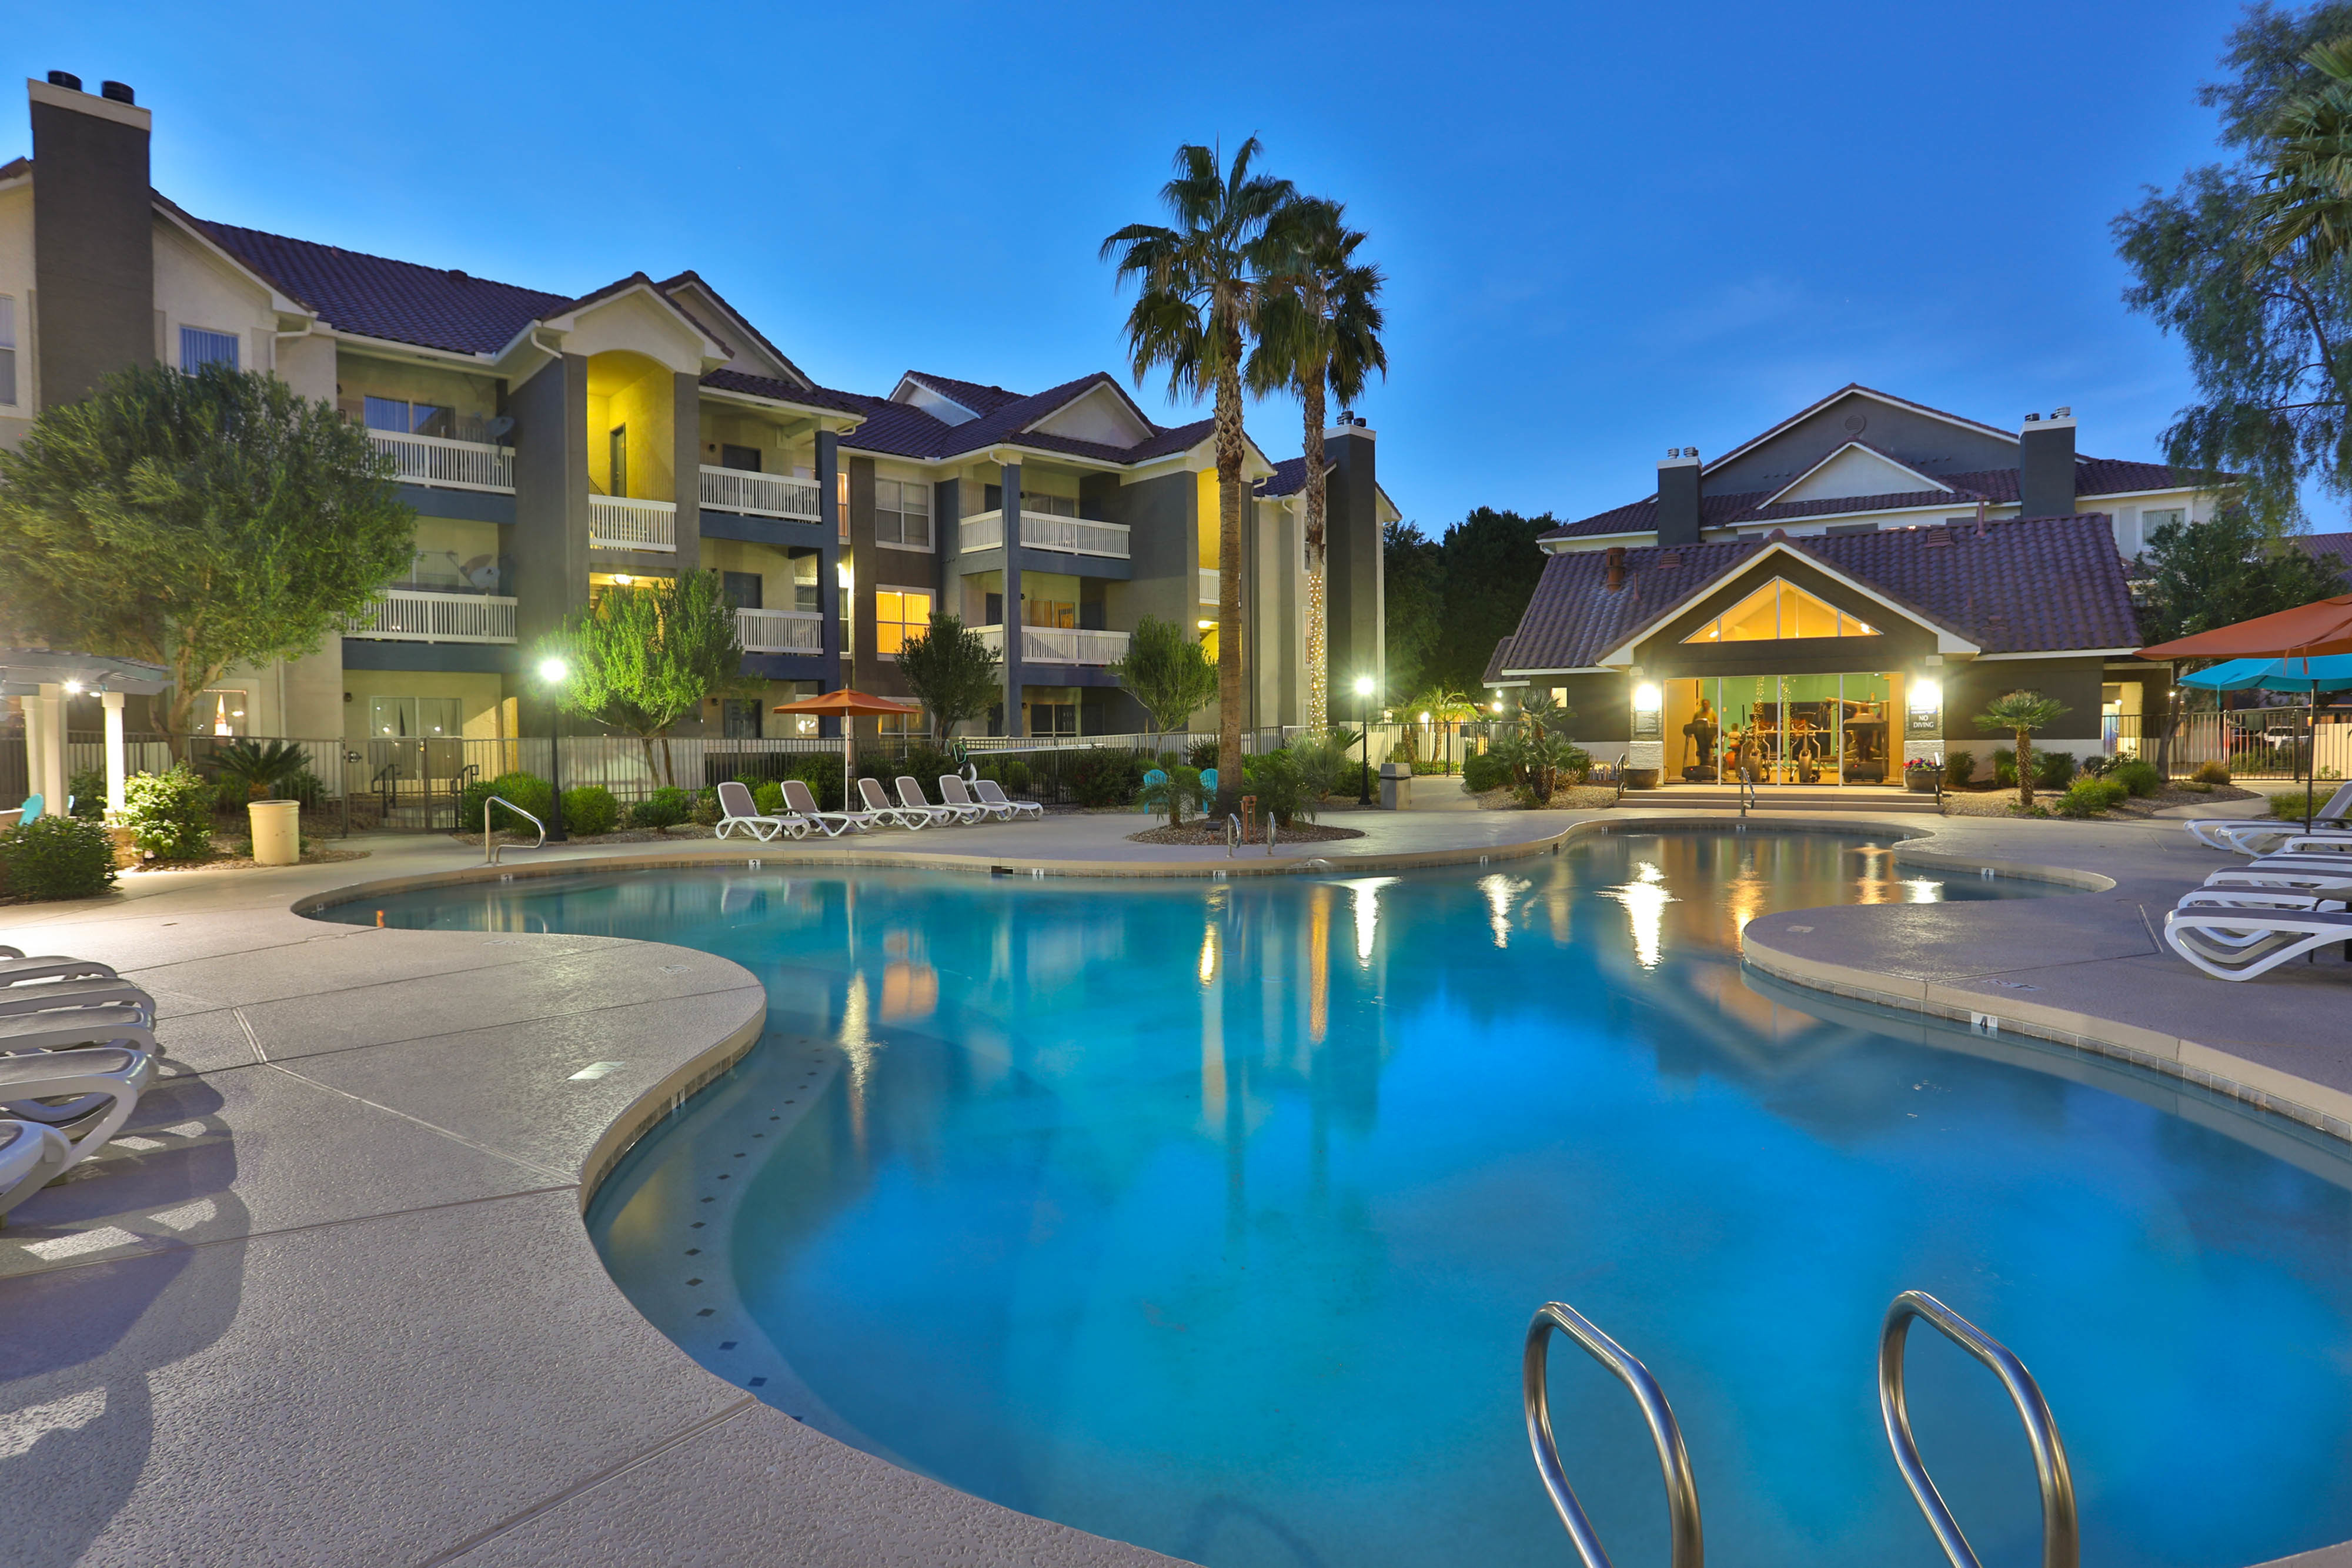 Swimming Pool | Apartment Homes in Phoenix, AZ | Arboretum at South Mountain